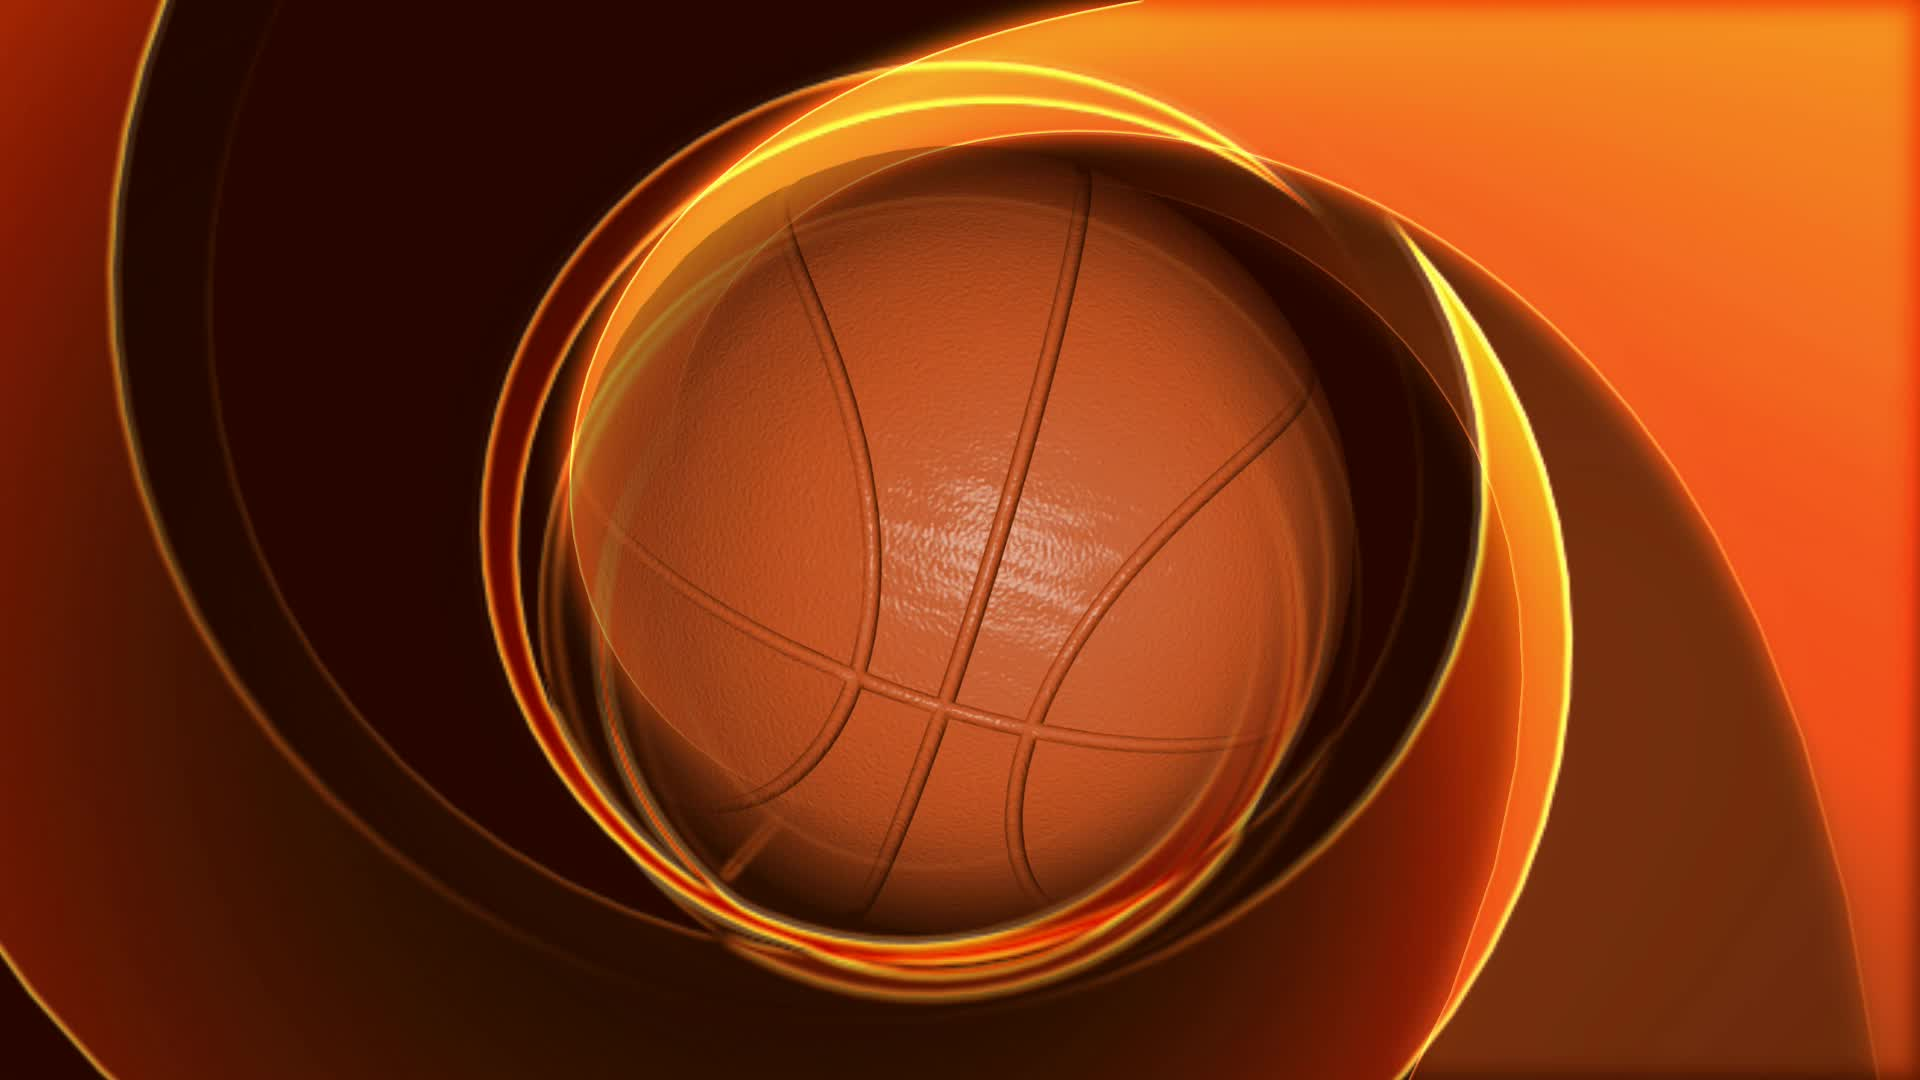 Mira dibujos animados gratis Spinning Basketball on Abstract Background